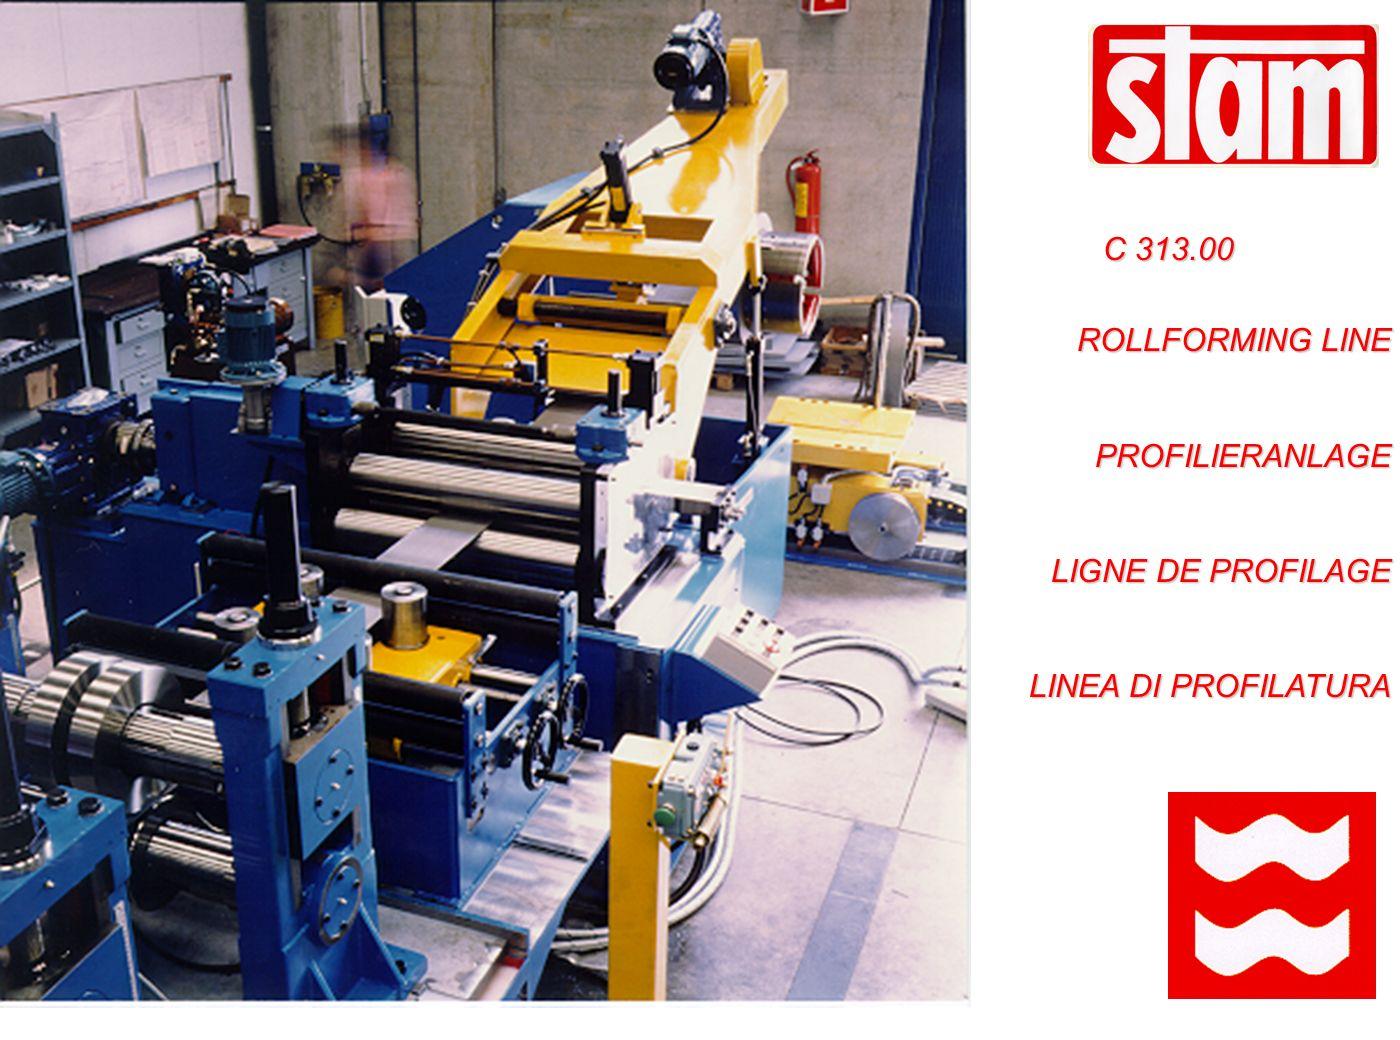 C 313.00 ROLLFORMING LINE PROFILIERANLAGE LIGNE DE PROFILAGE LINEA DI PROFILATURA